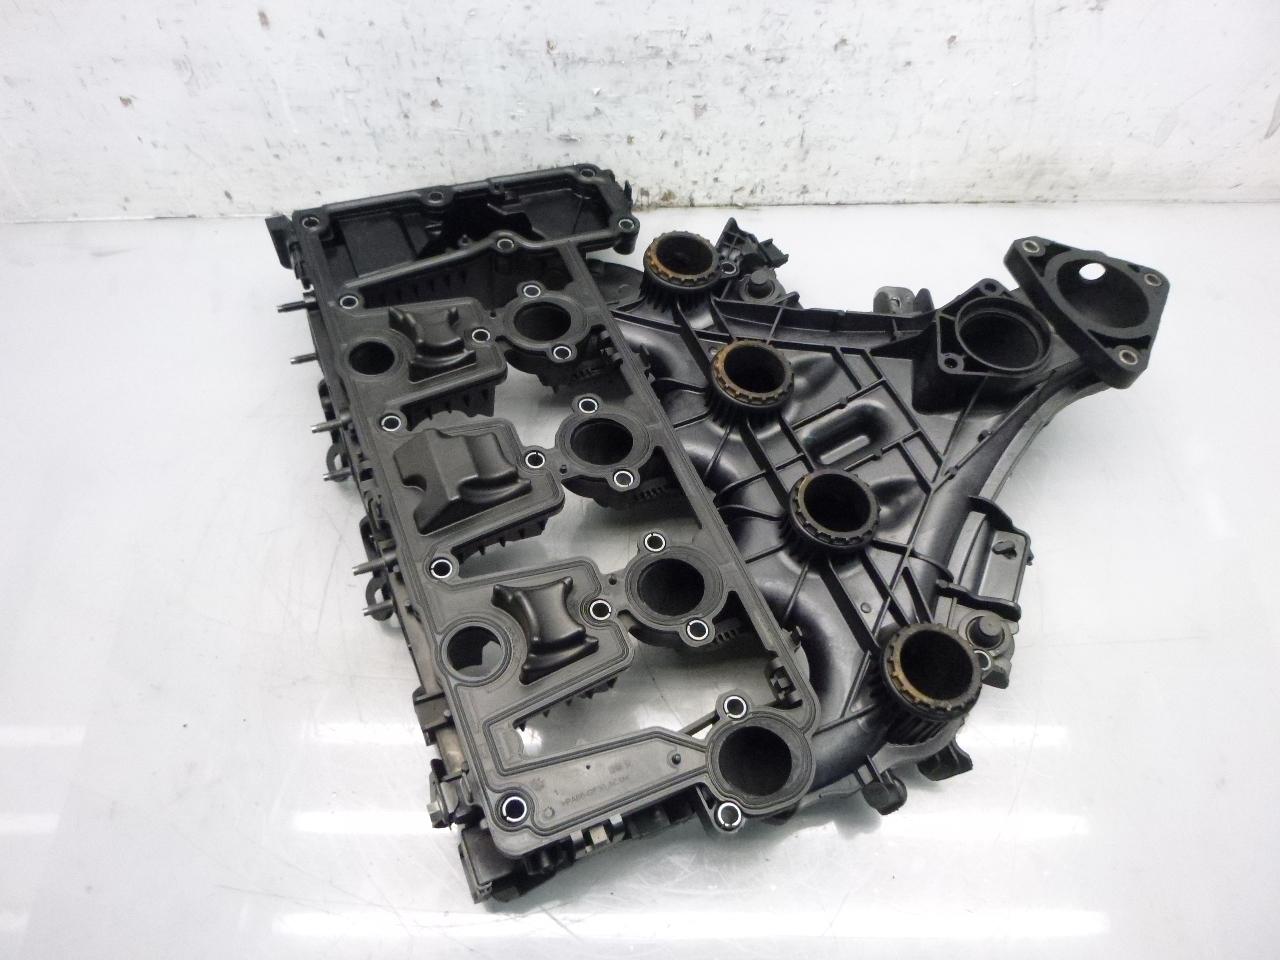 COPERCHIO VALVOLA CITROEN FIAT FORD PEUGEOT 2.2 TDCi Puma 6c1q-6k271bh//valve cover